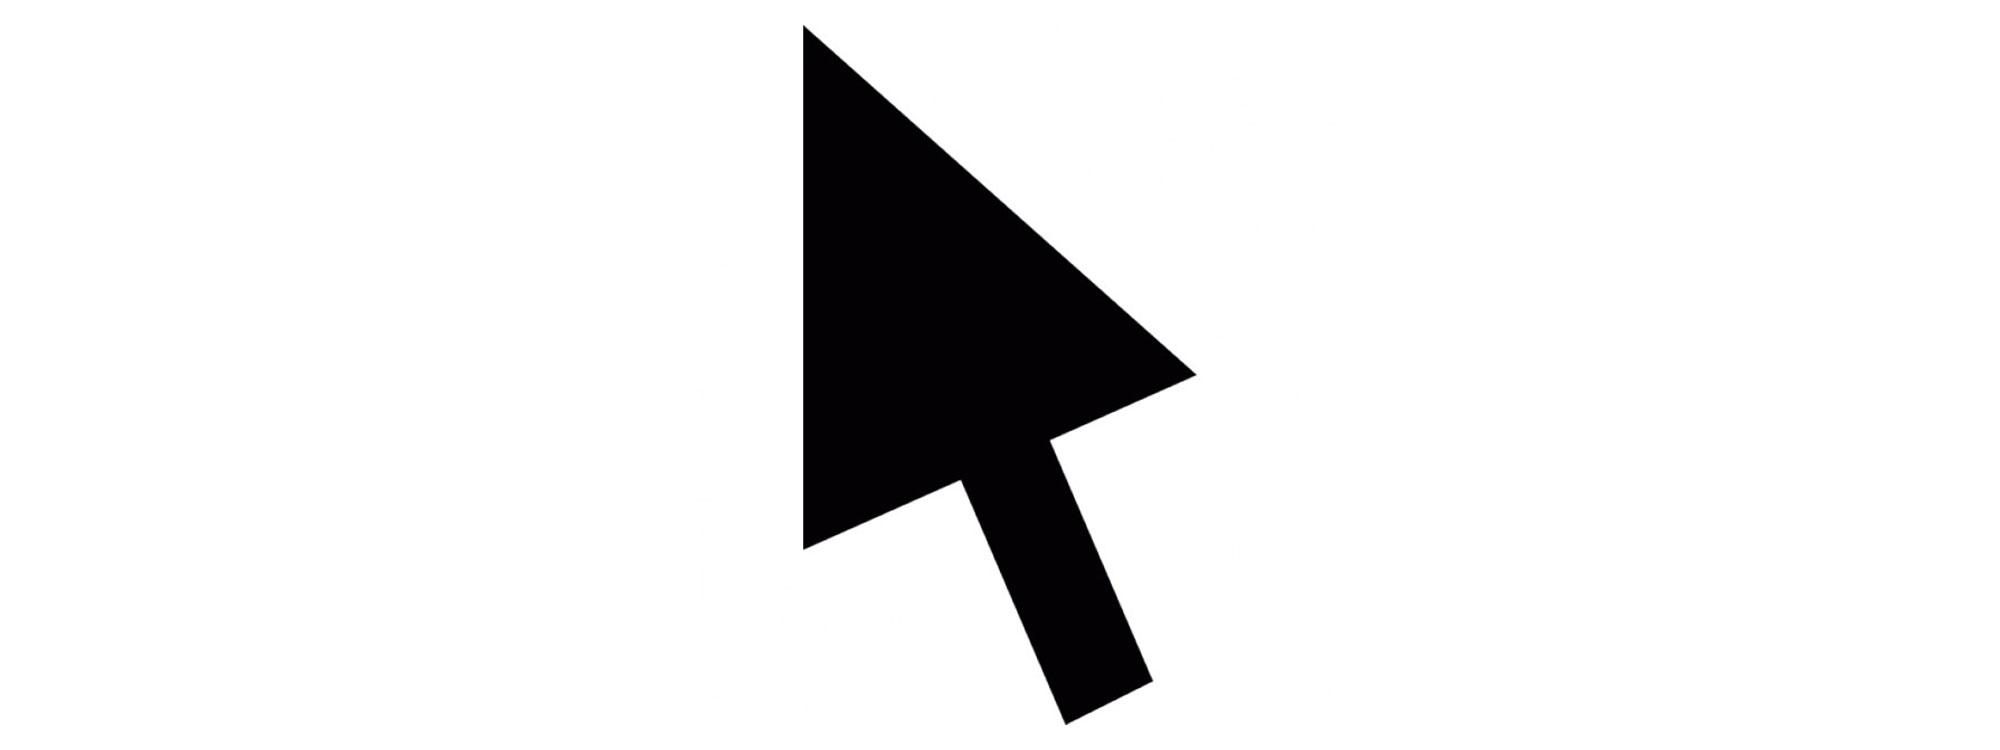 Using Emoji as Cursors | CSS-Tricks